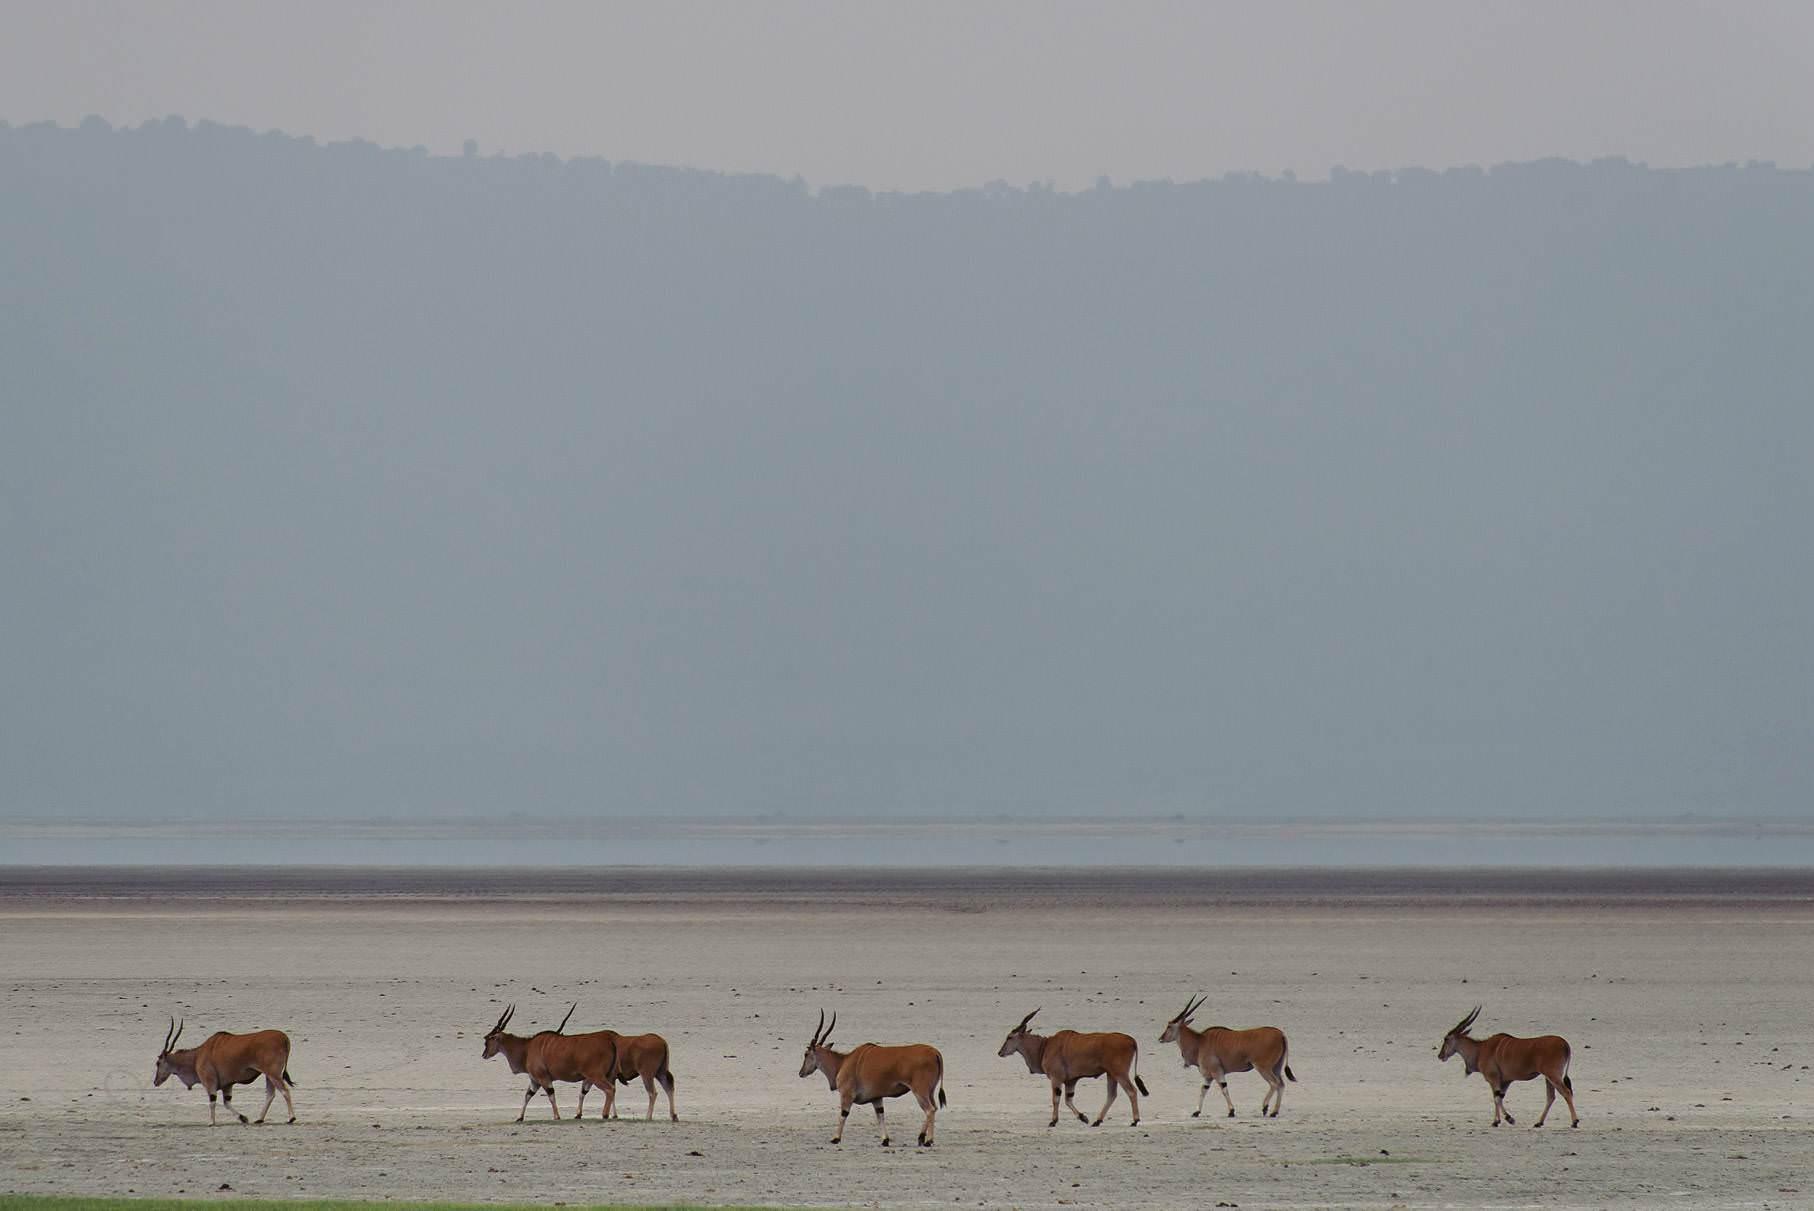 0052 tansania nd8 1684 anne bjoern fotografie hochzeitsfotograf hamburg - This is Tanzania - Serengeti, Kilimanjaro & Sansibar